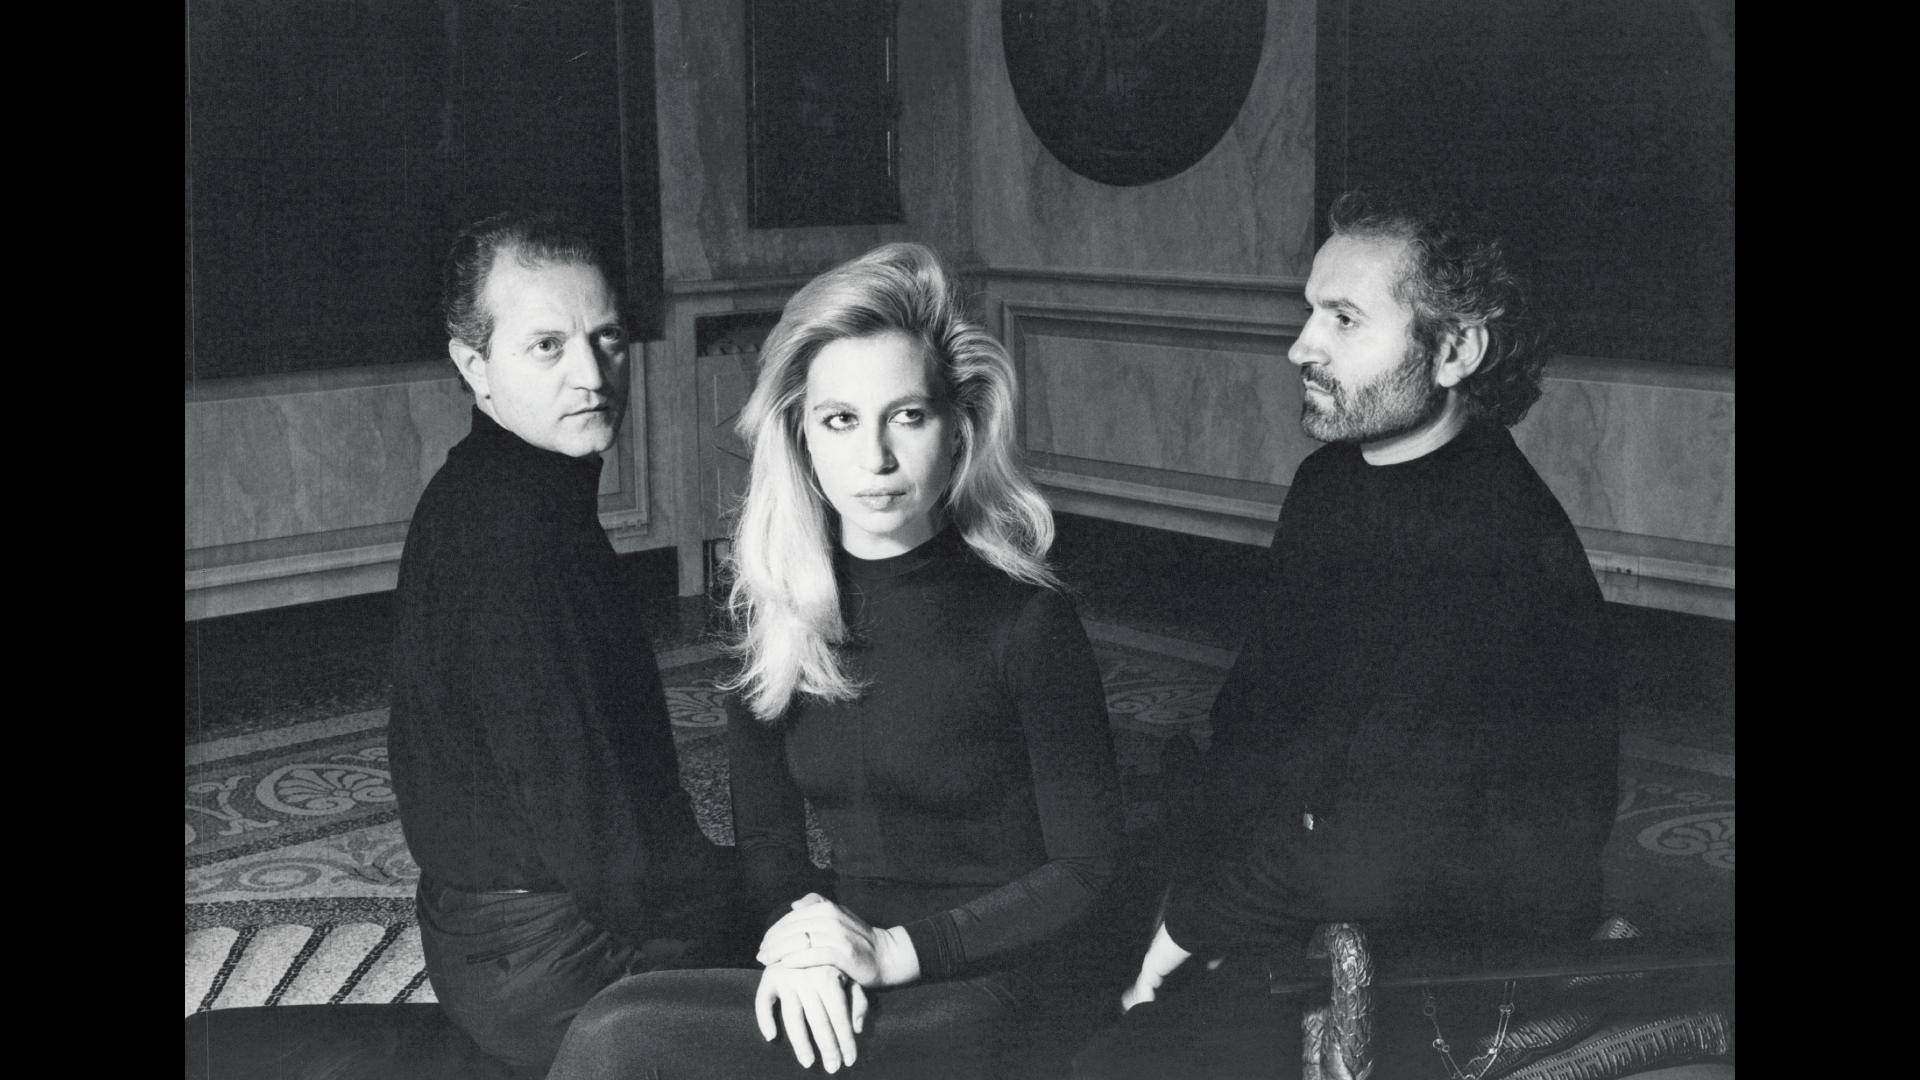 Santo, Donatella And Gianni